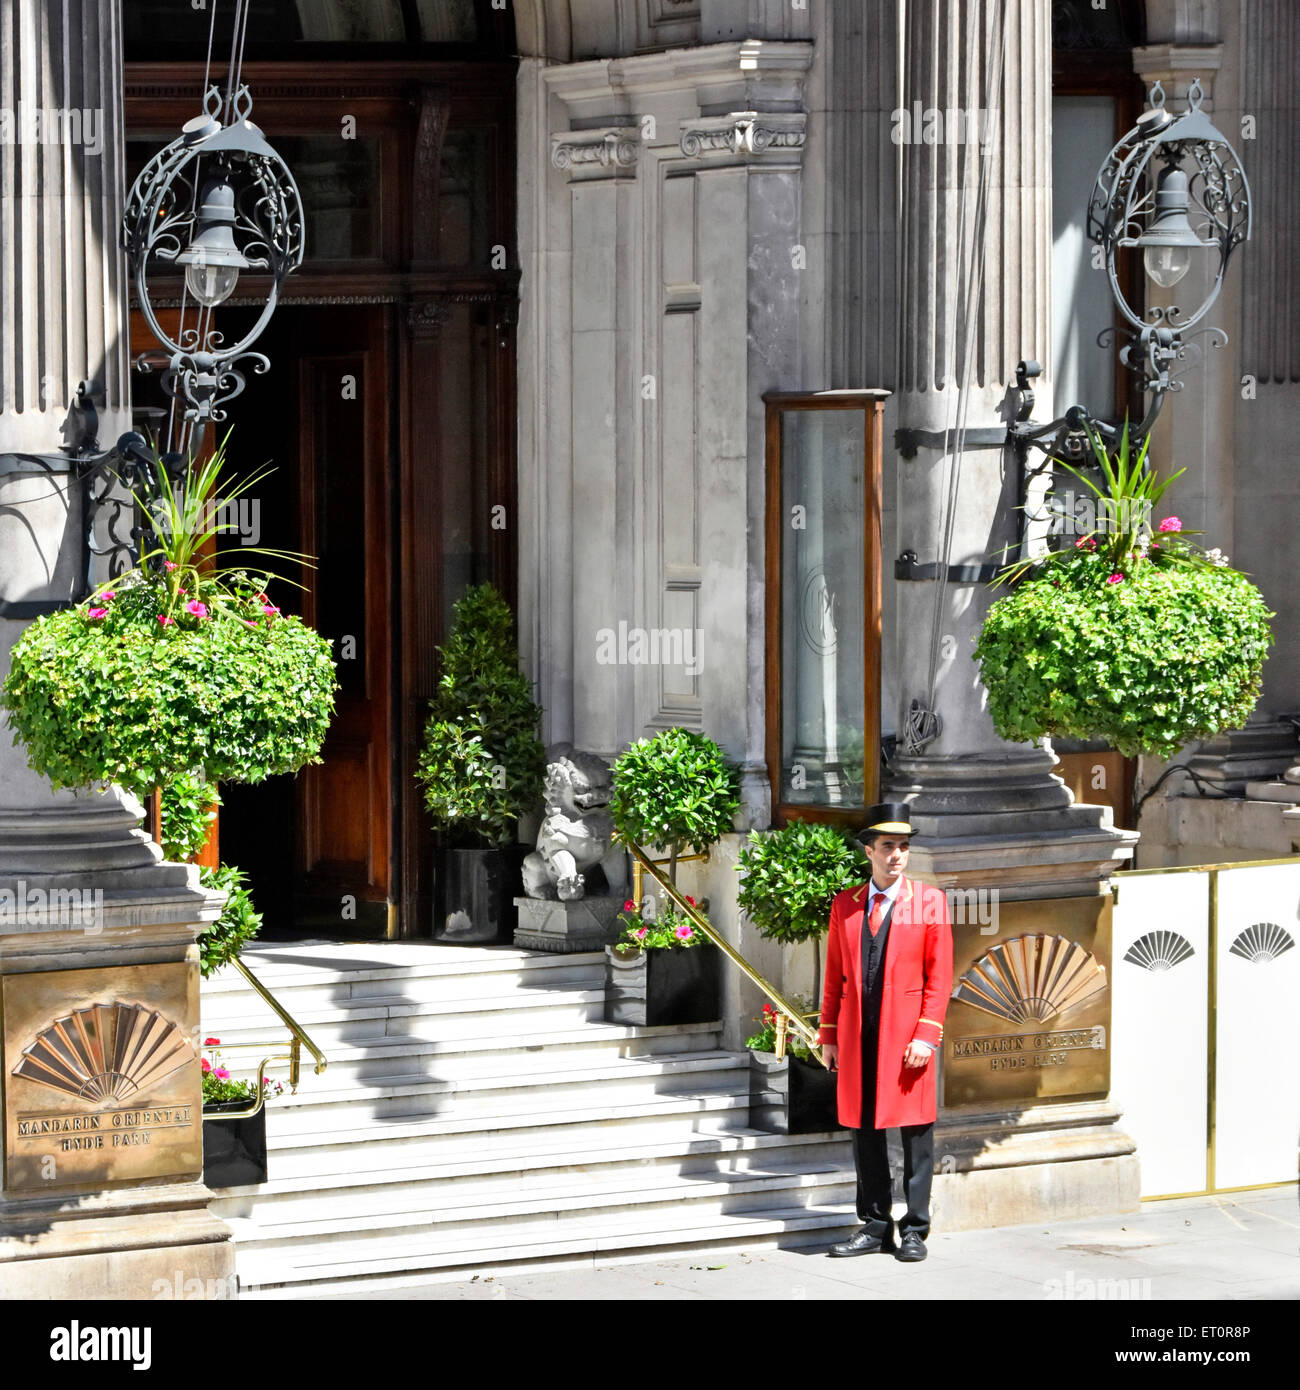 Doorman outside the Mandarin Oriental Hotel Hyde Park Knightsbridge London England UK - Stock Image